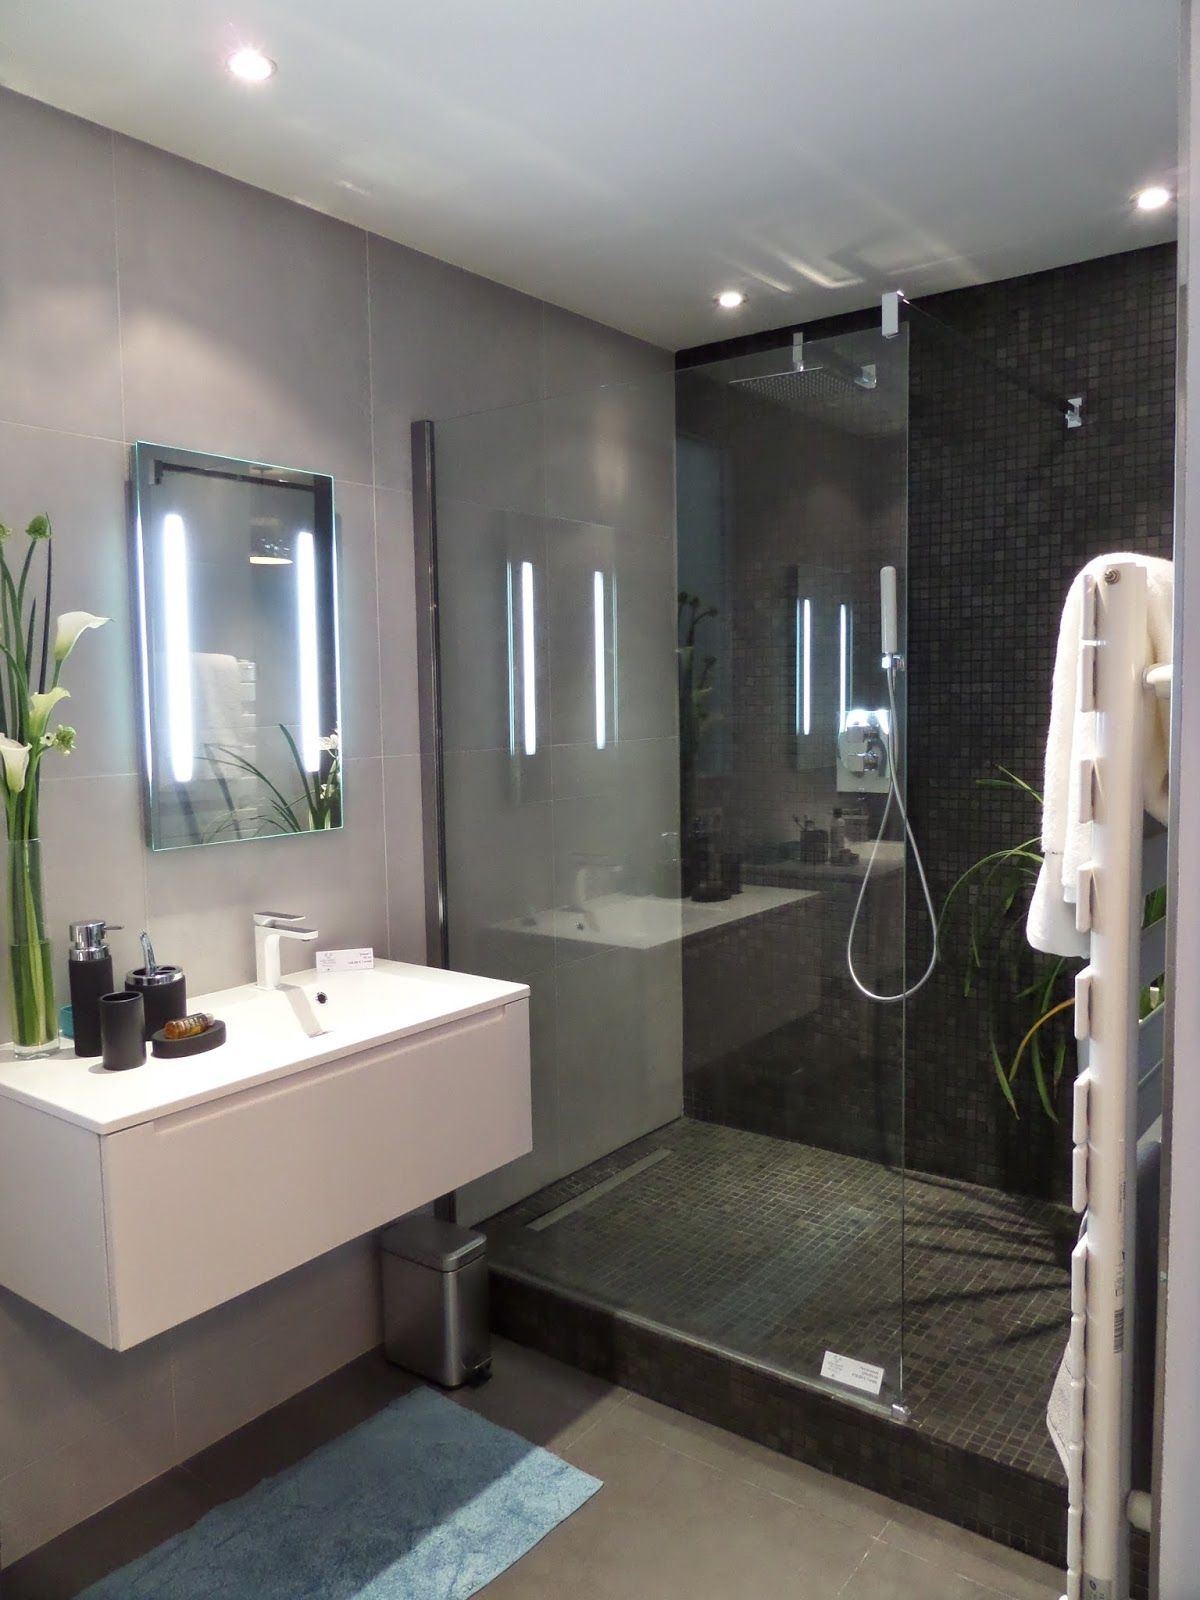 Espace Salle De Bain idee salle de bain petit espace meuble salle de bain